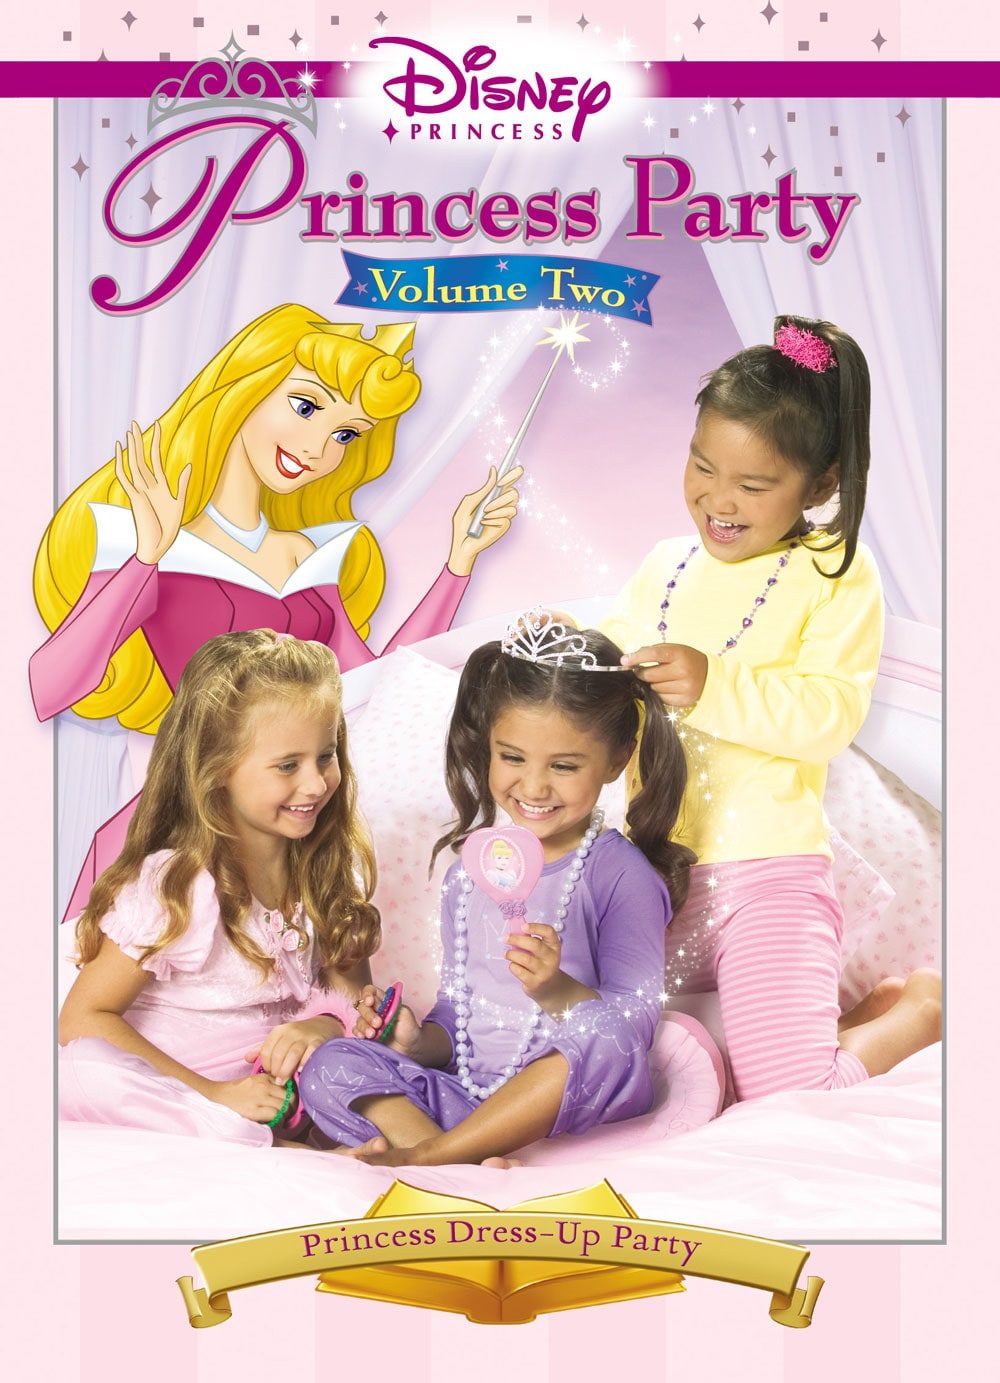 Disney Princess | Princess Party Volume 2 | Princess Dress-Up Party movie poster